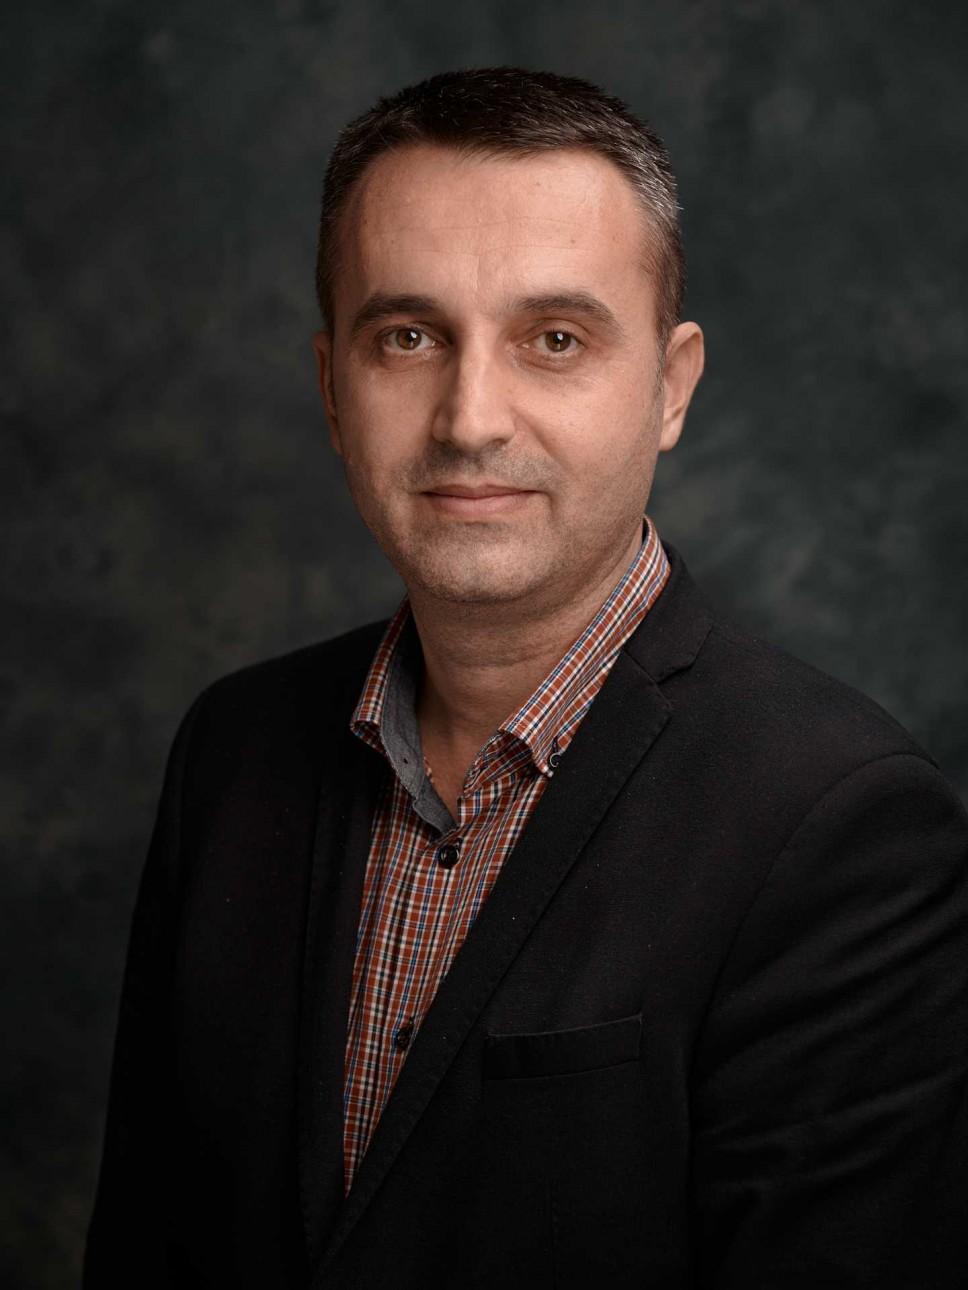 Biografija - Mićanović Veselin